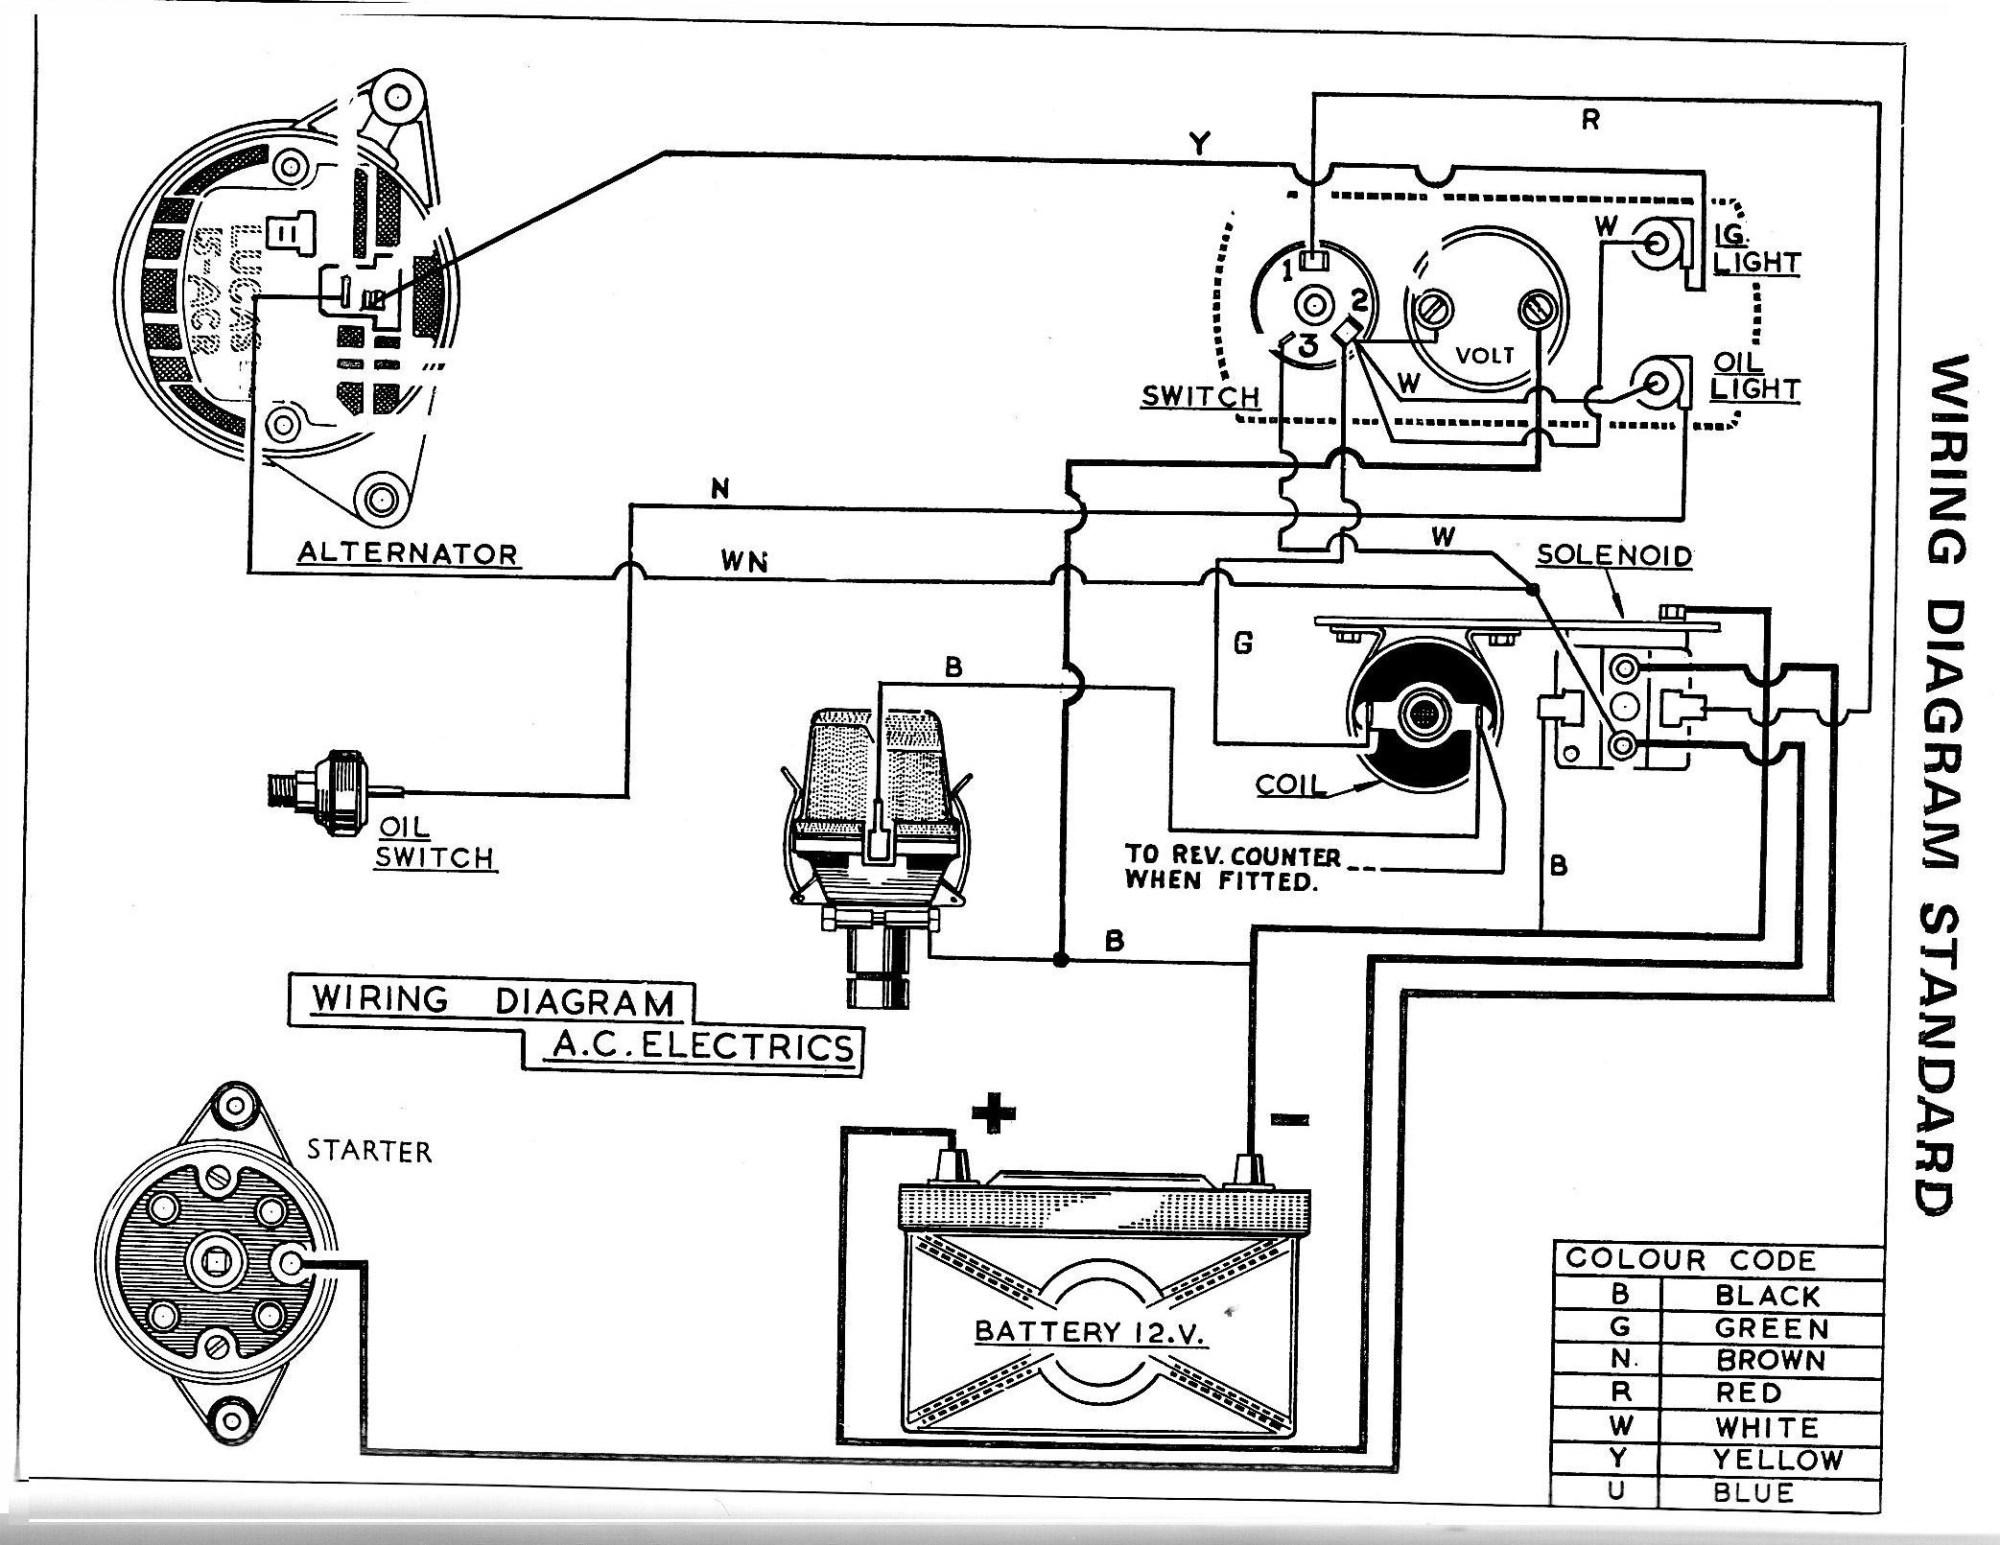 hight resolution of c3 corvette manual transmission conversion kit